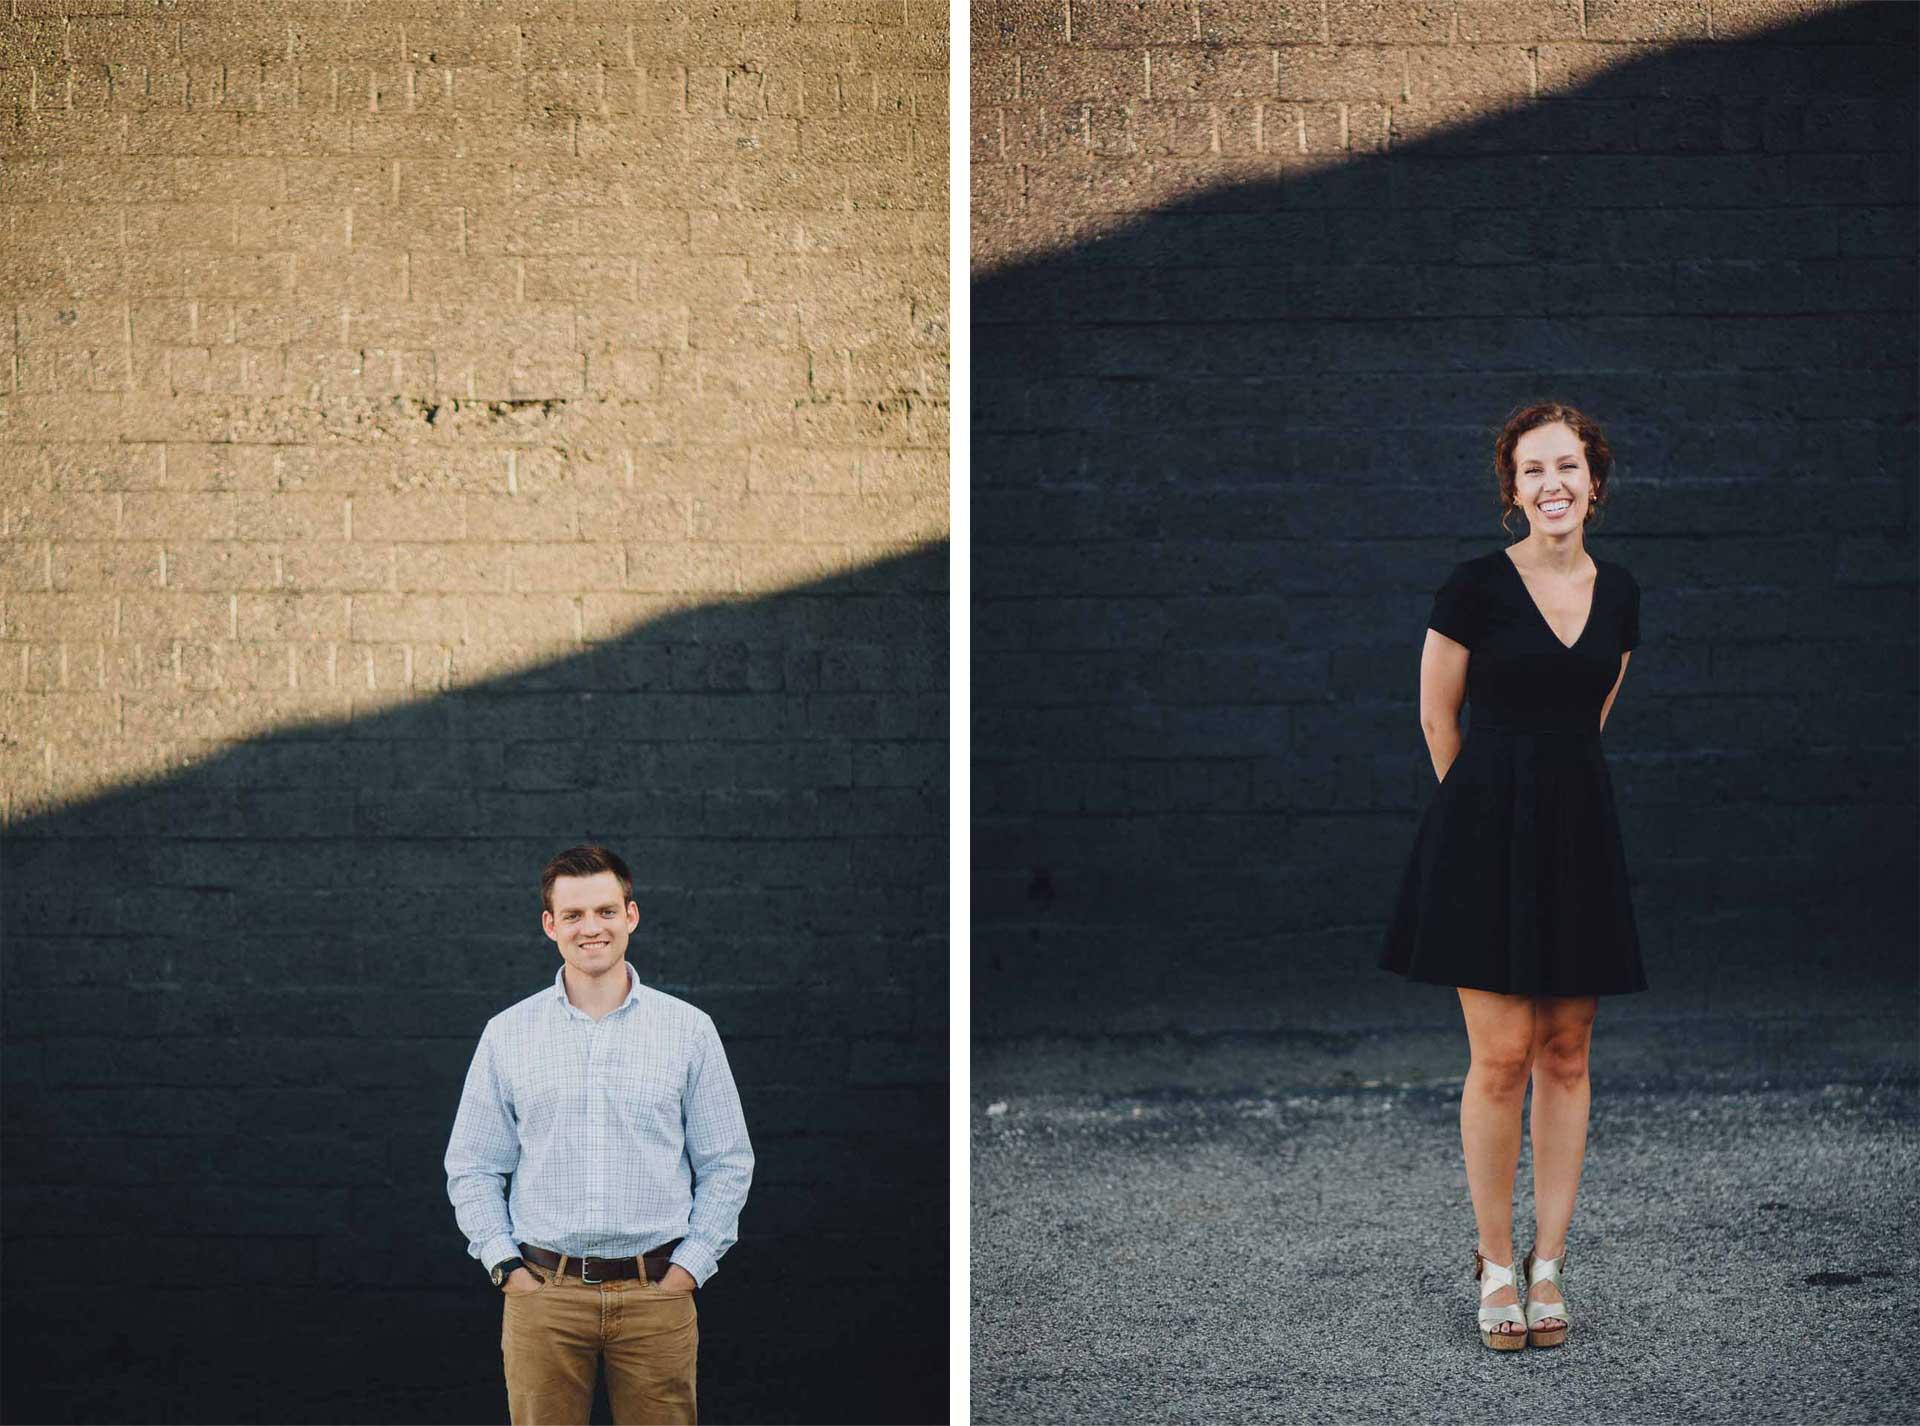 Emily-Dan-Dayton-Engagement-017@2x.jpg